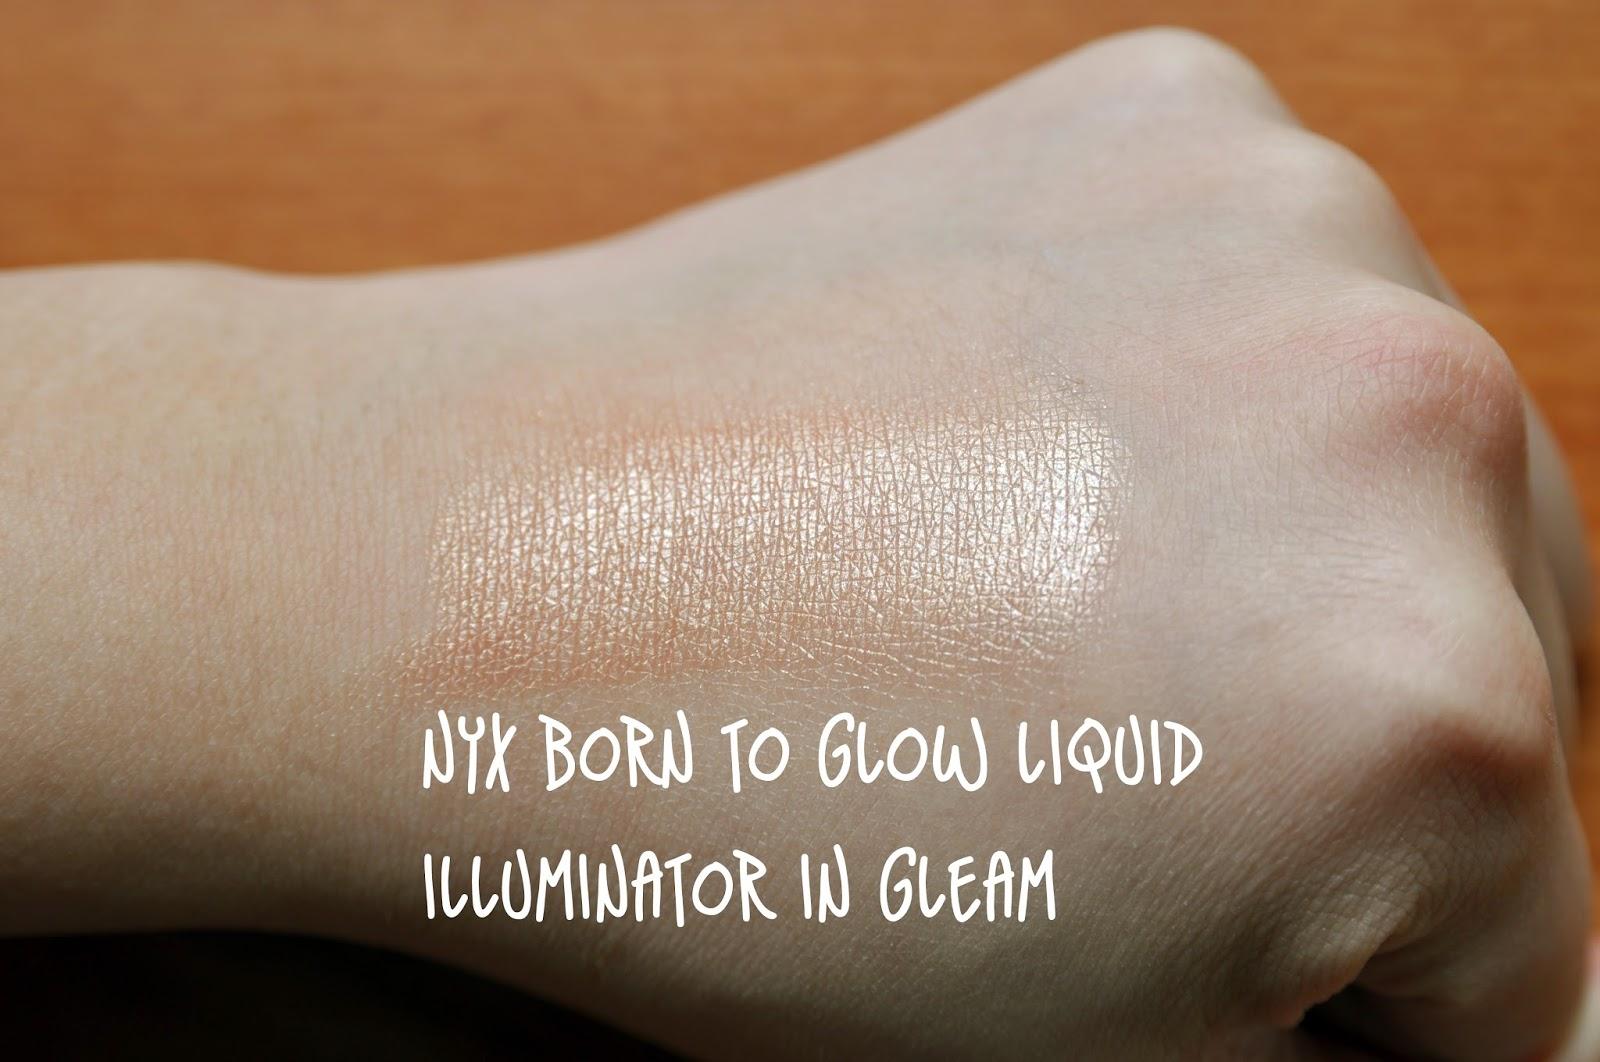 Liquid Illuminator by ULTA Beauty #6